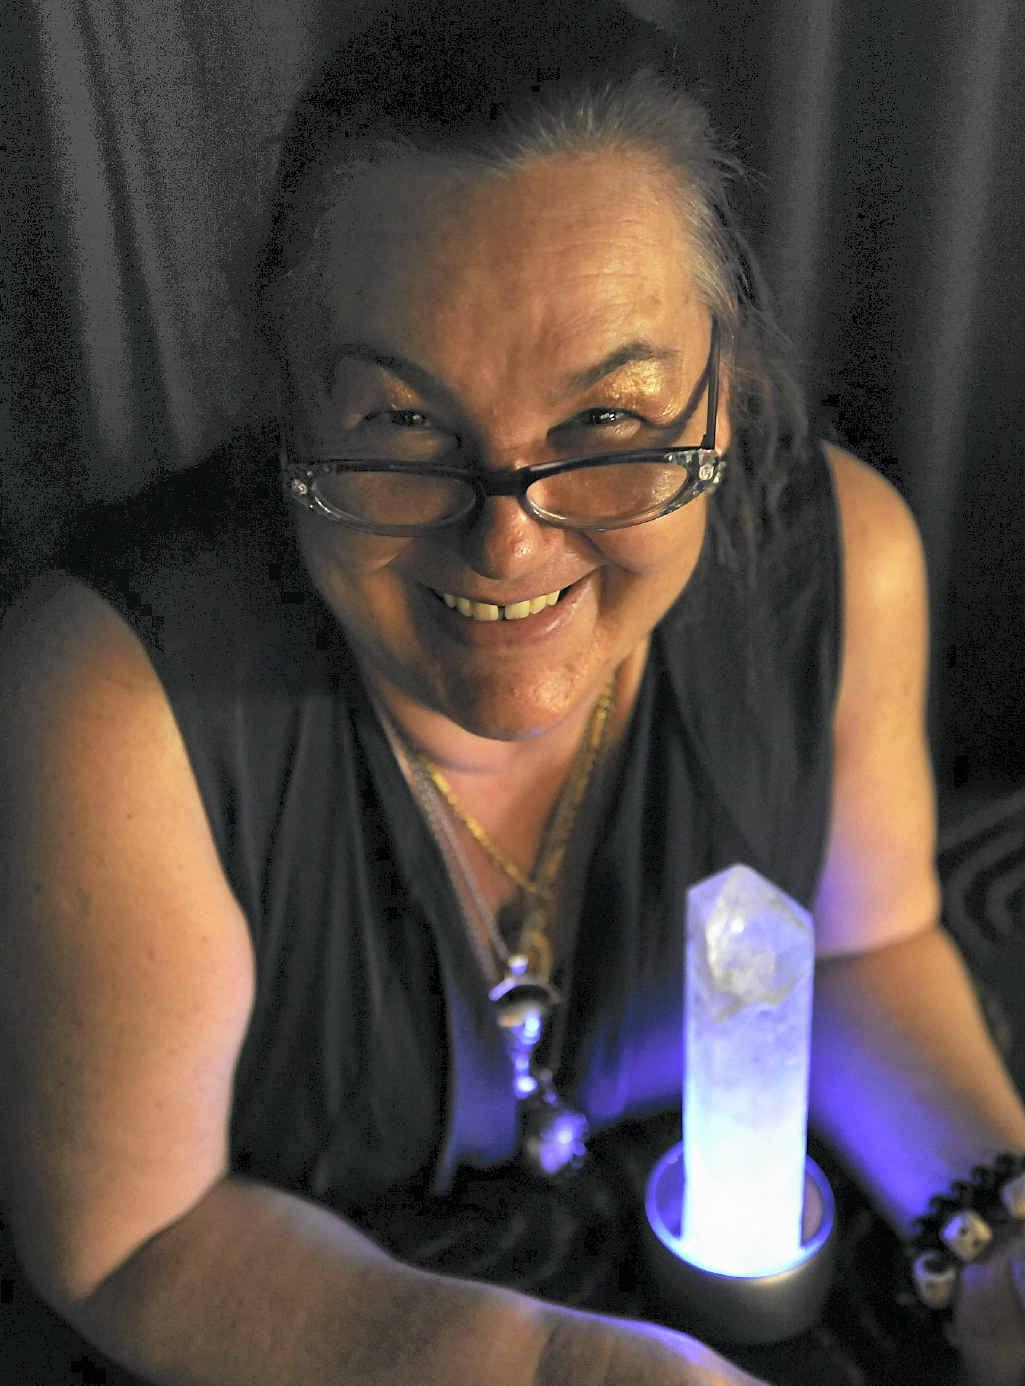 PSYCHIC EXPO: Australian Psychic Expo Co coordinator Konnie Gold.